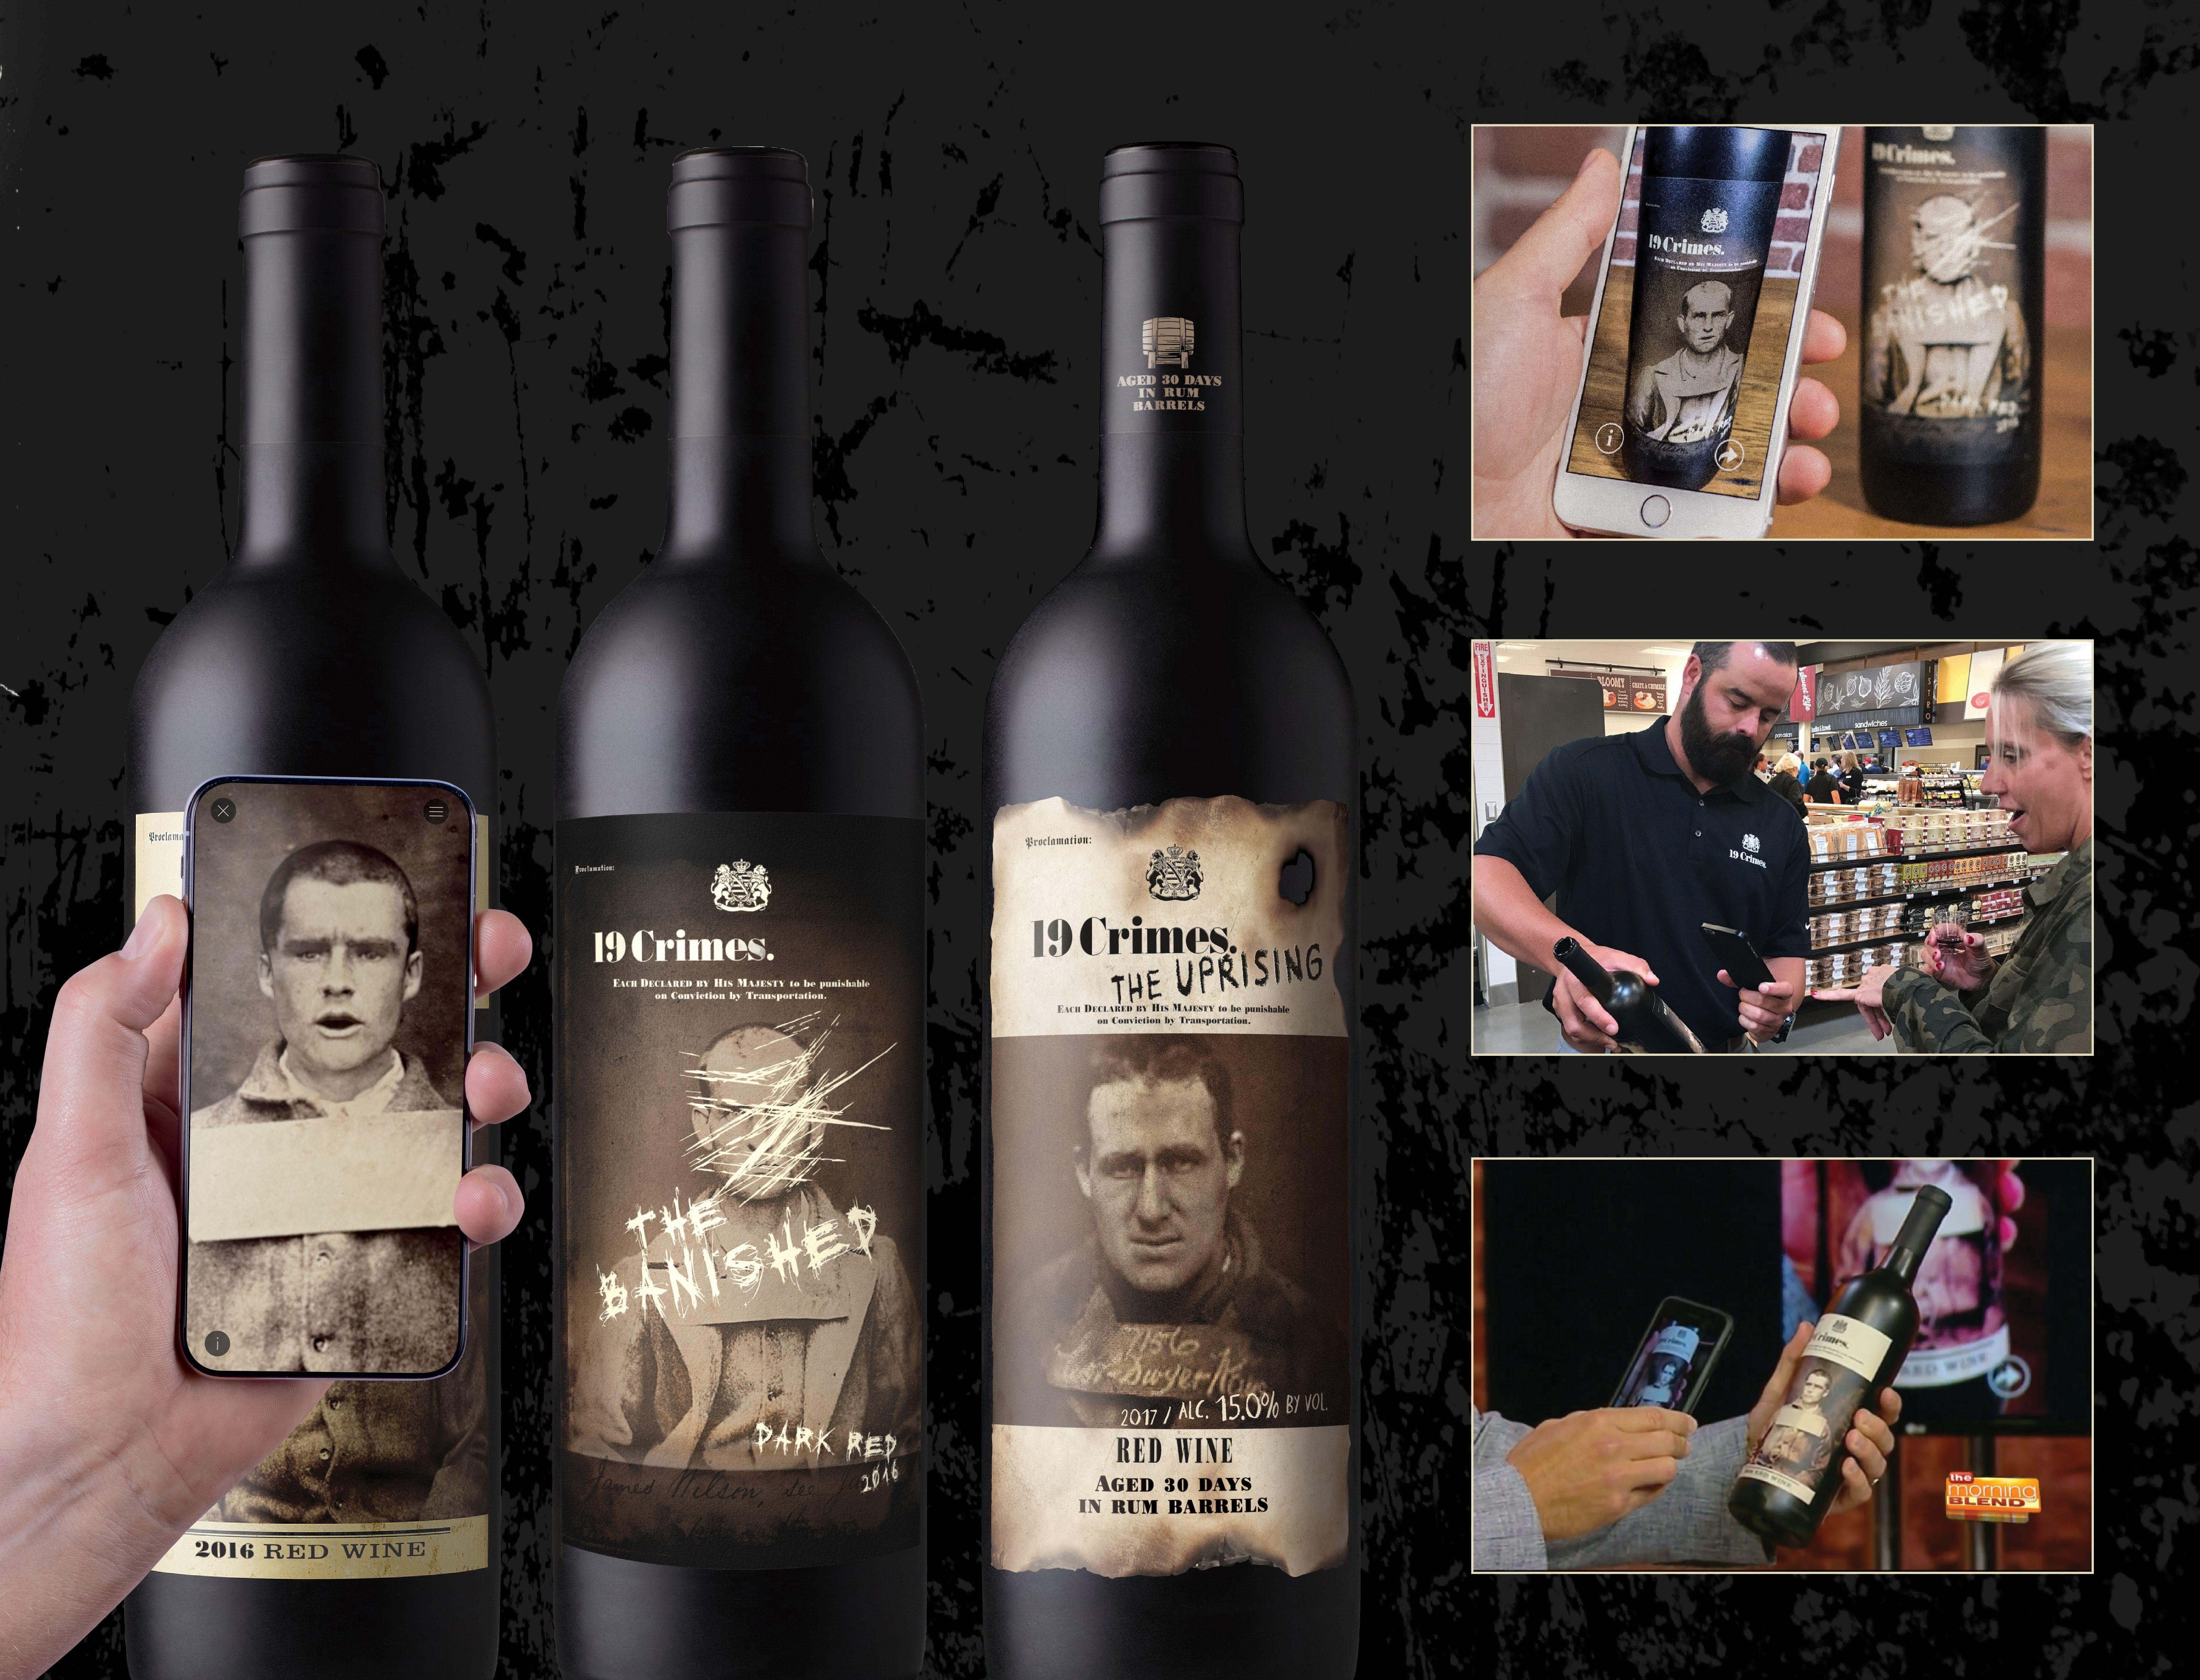 19 Crimes Wine 19 Crimes Confessing Labels 19 crimes